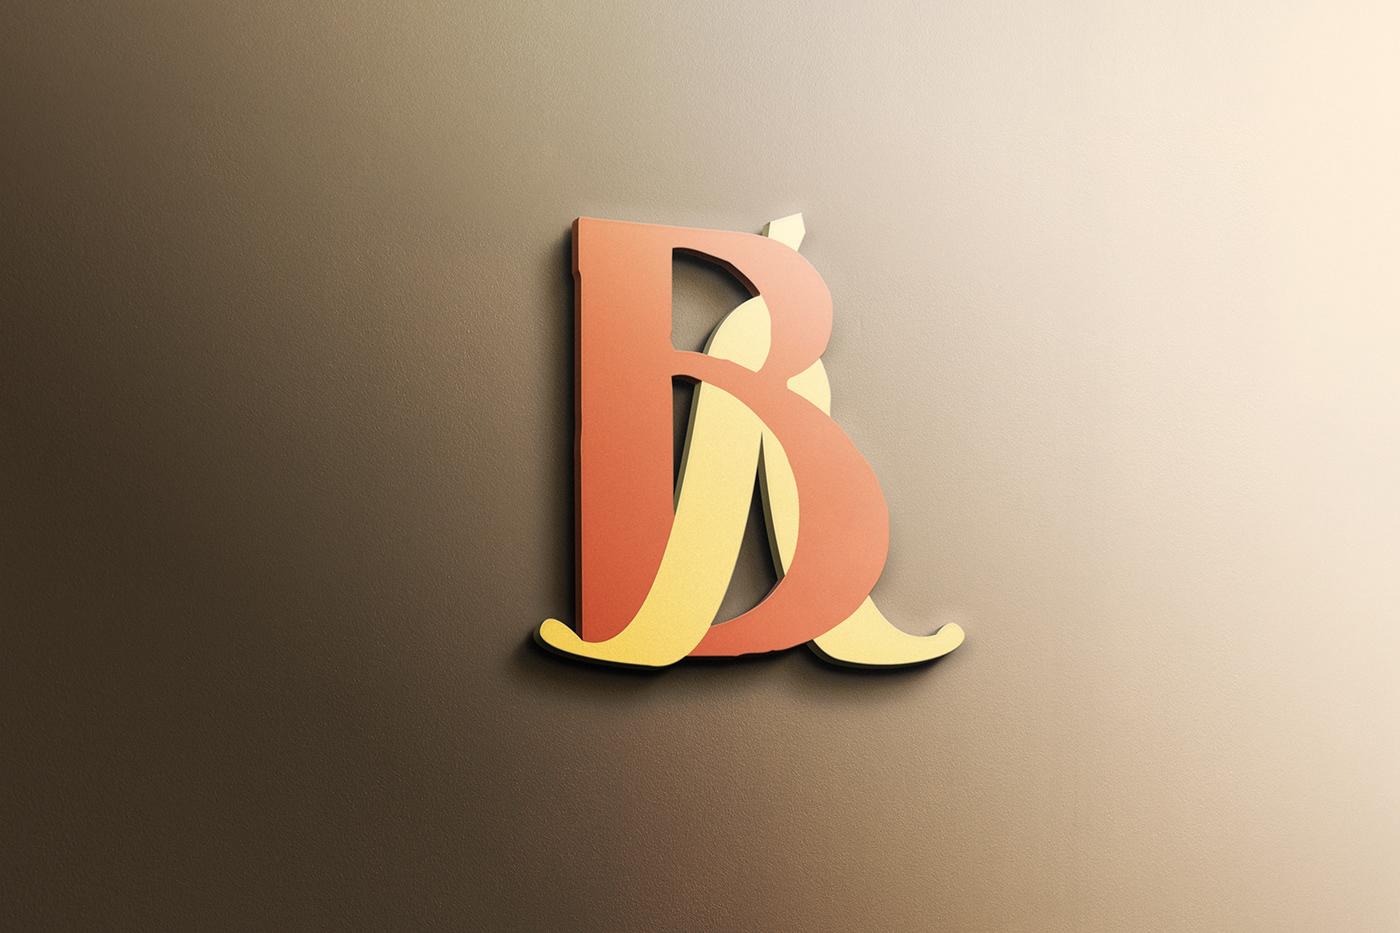 brand branding  creative design NewConcept BrandStudio Celebranding disruptive marketing   Photography